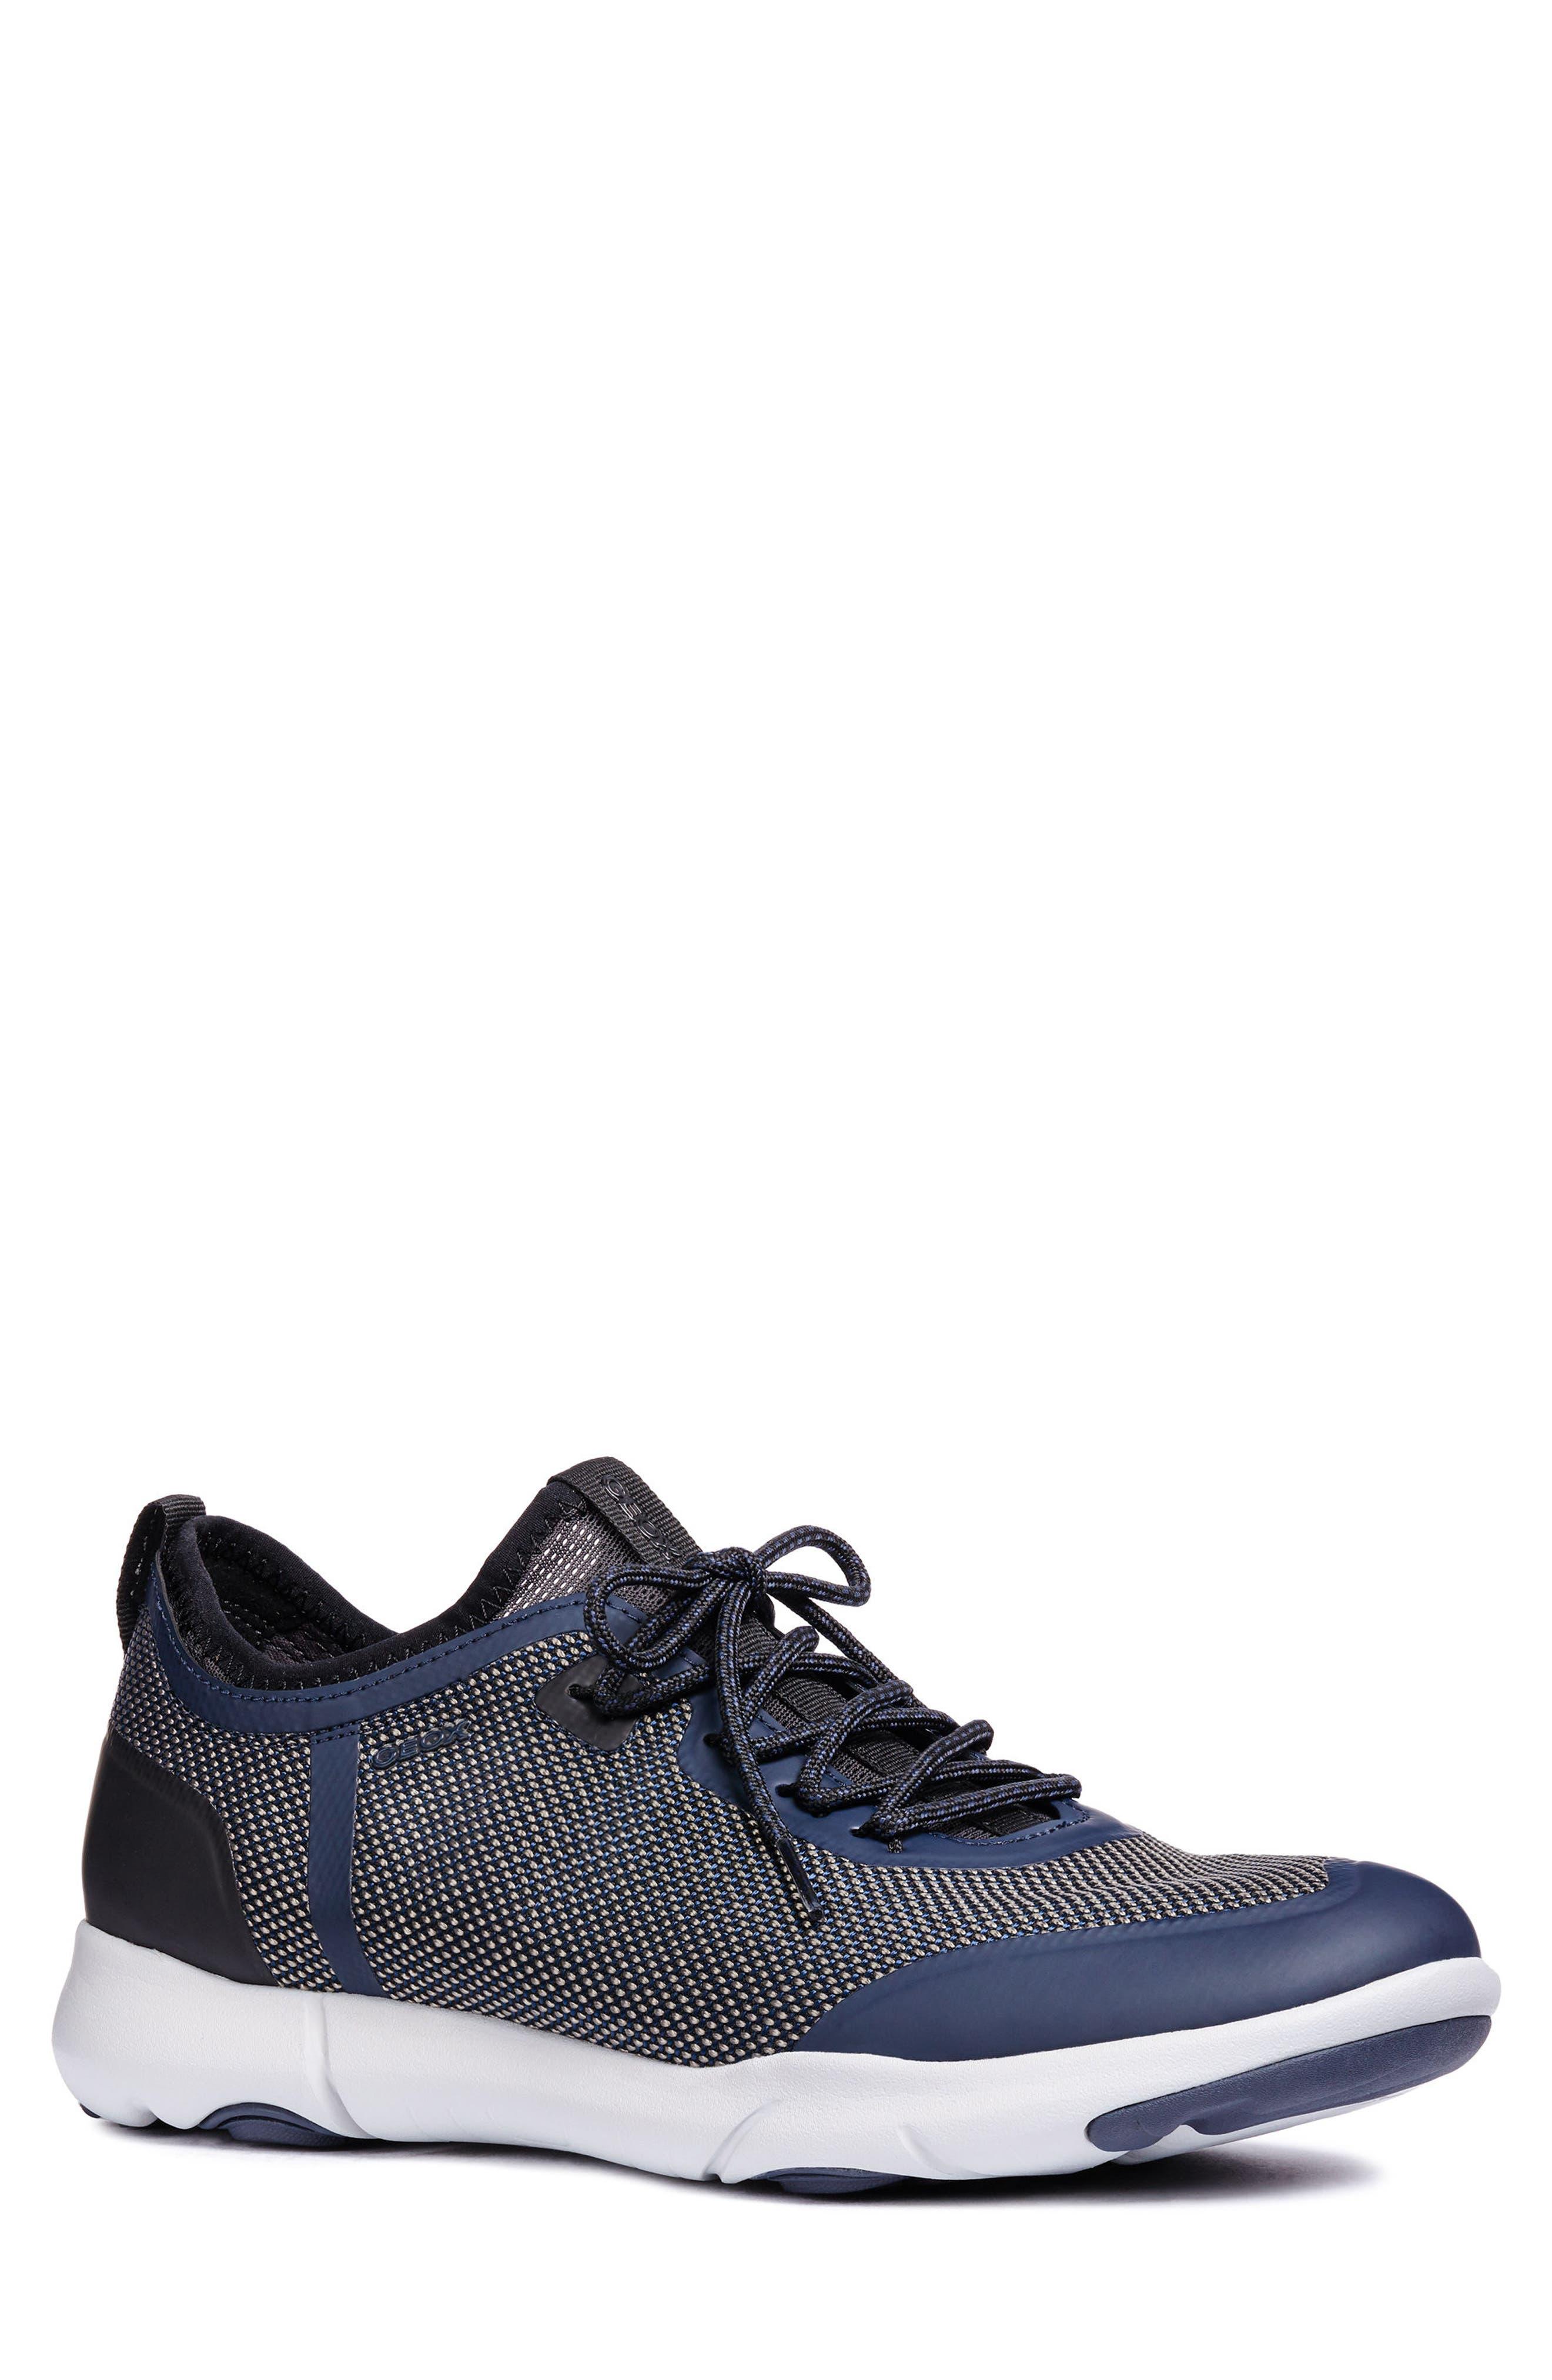 Geox Nebula X 3 Low Top Sneaker